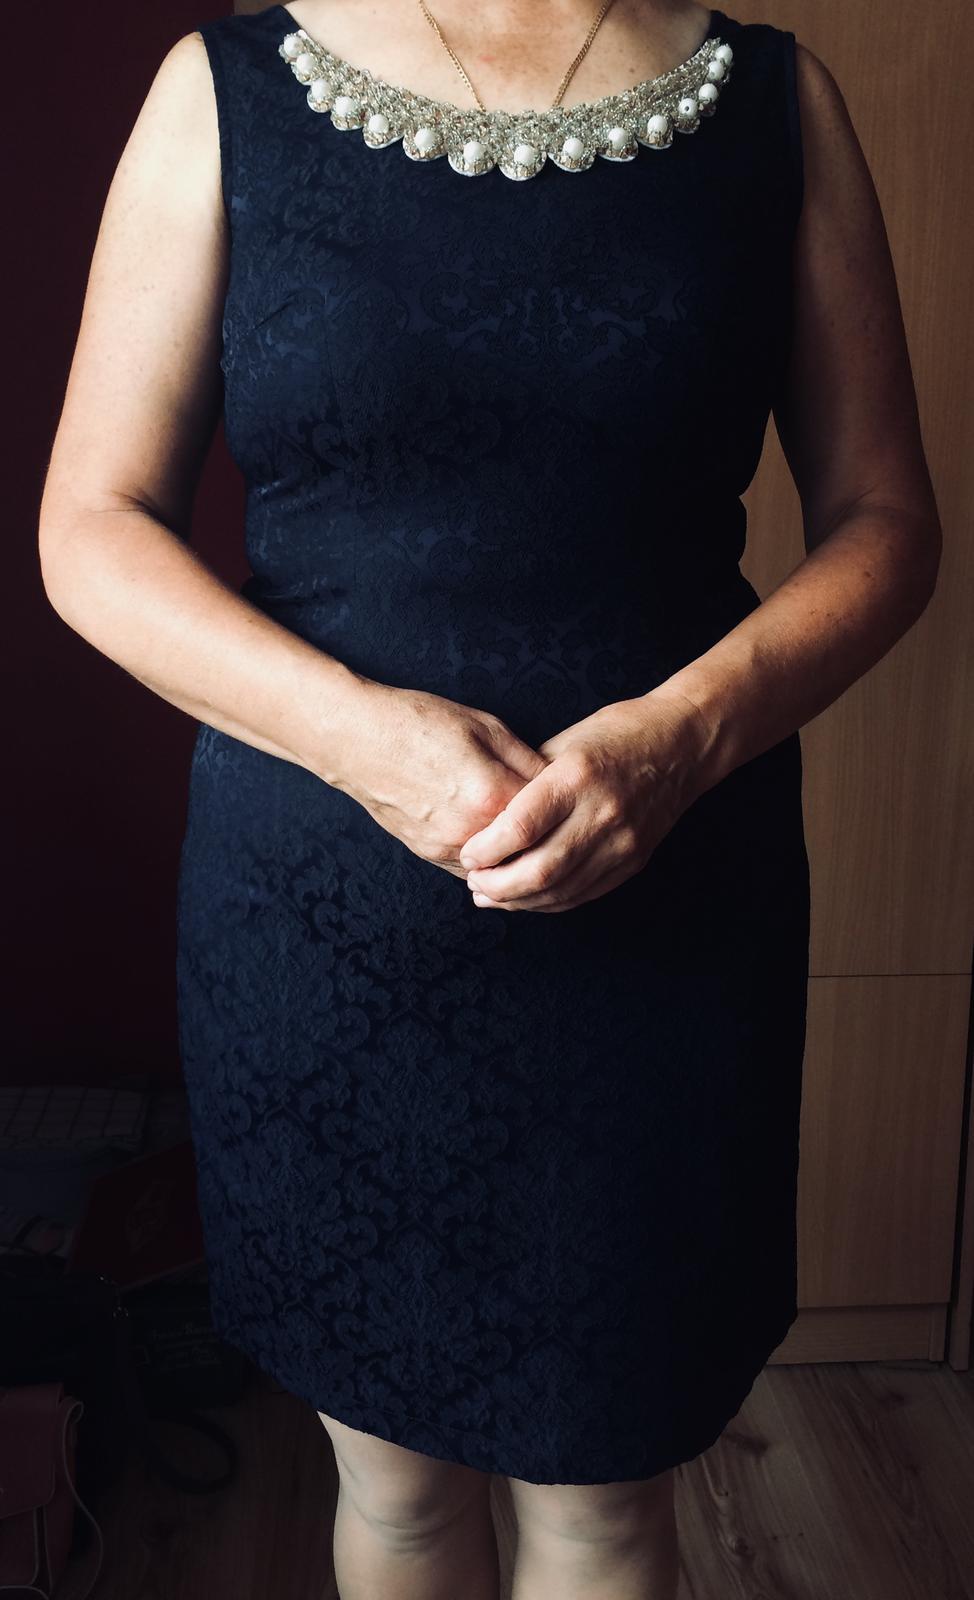 Kráľovsky modré šaty - Obrázok č. 1